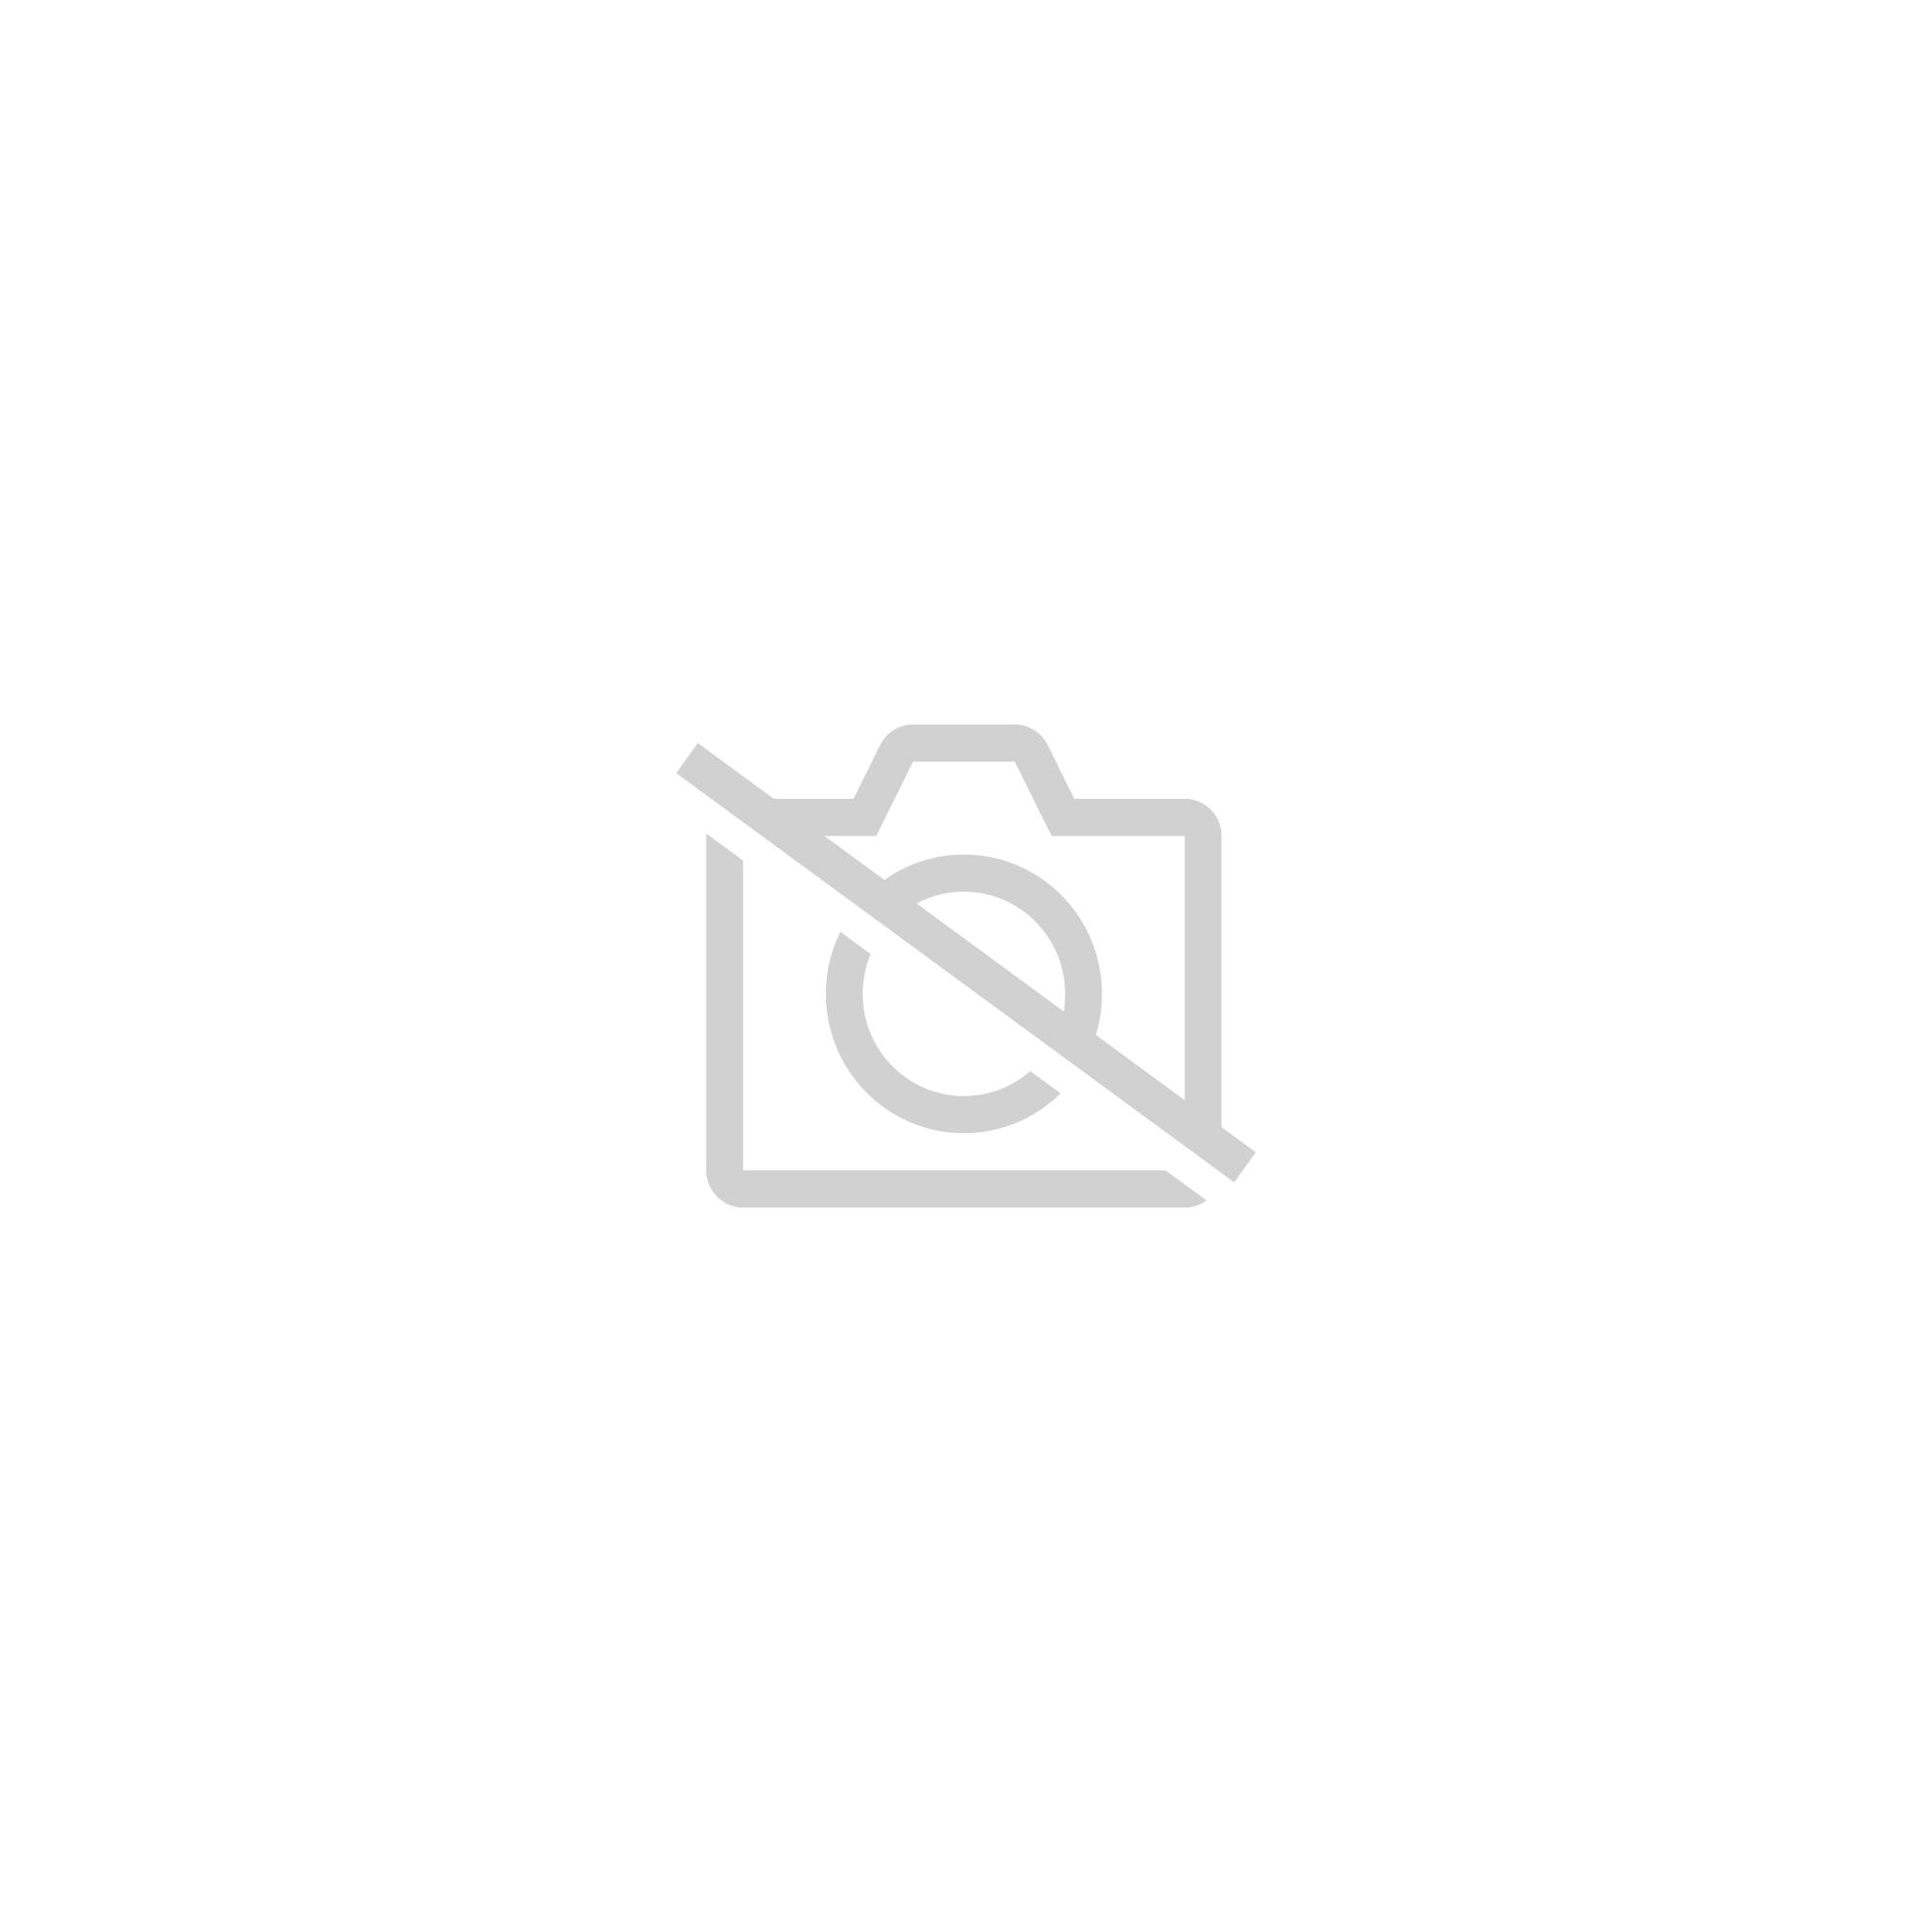 S05-FP Fr Mercedes-Benz A-Klasse W169 3/5-Tr 05-12 Stahl ...